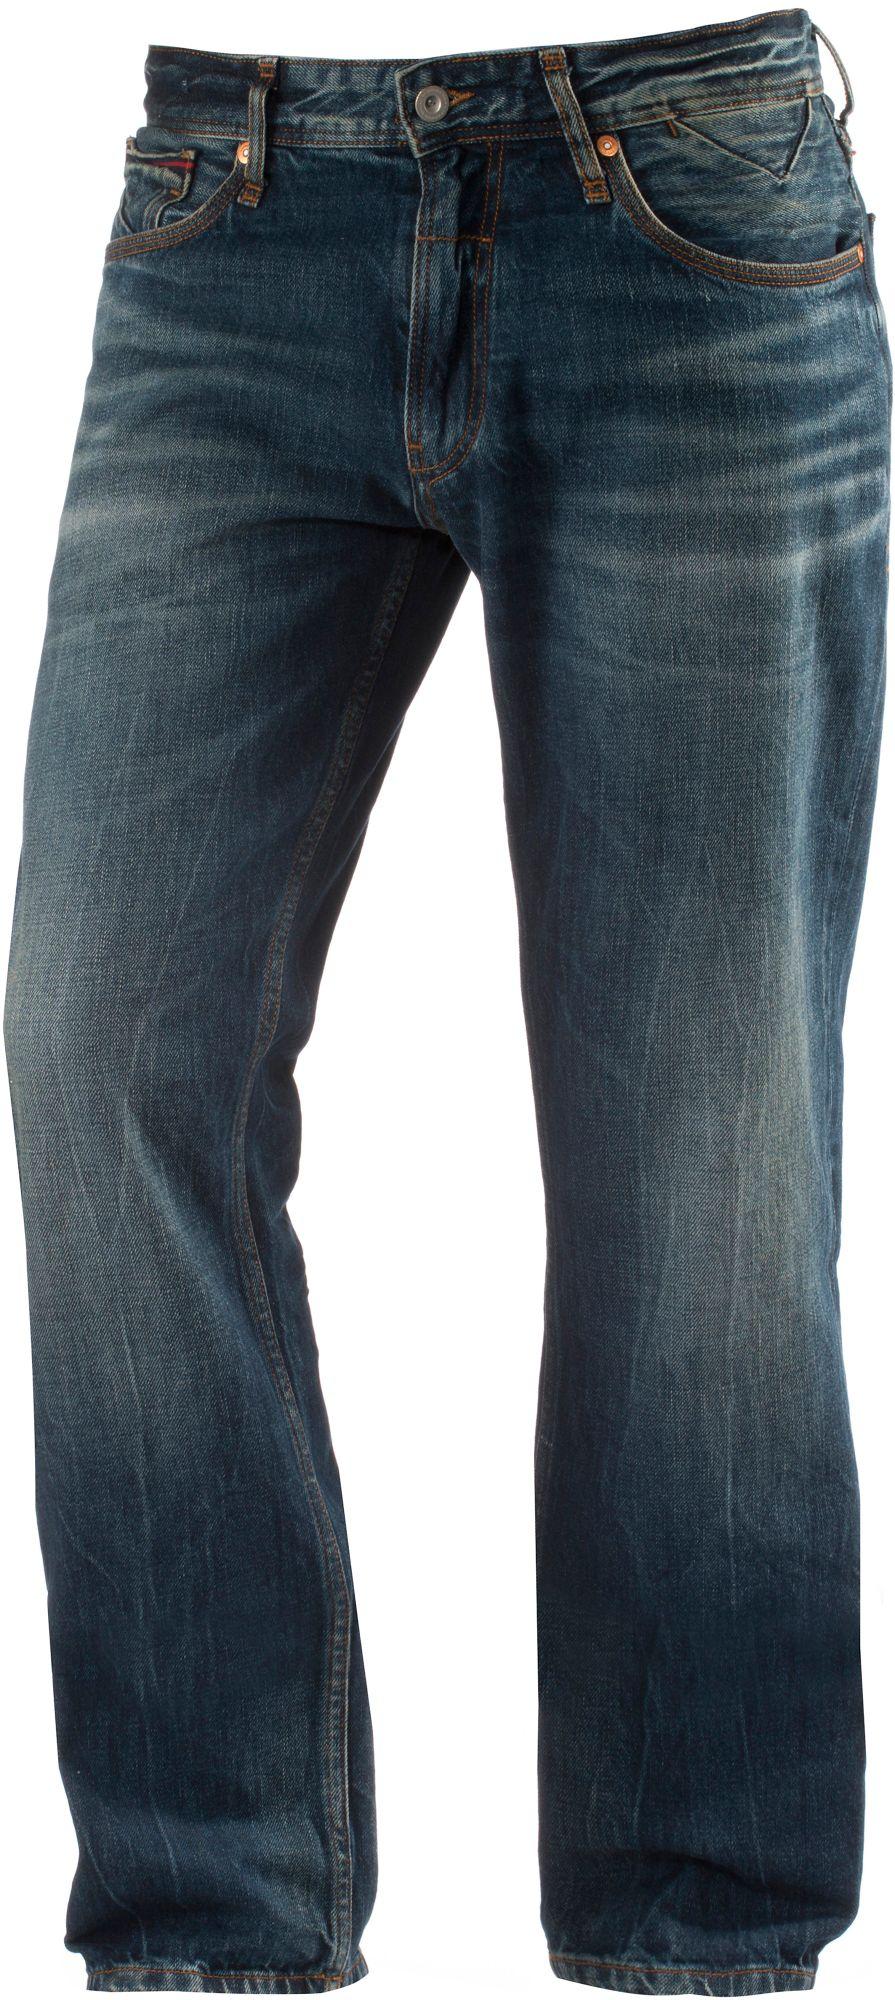 tommy hilfiger herren jeans preisvergleiche. Black Bedroom Furniture Sets. Home Design Ideas